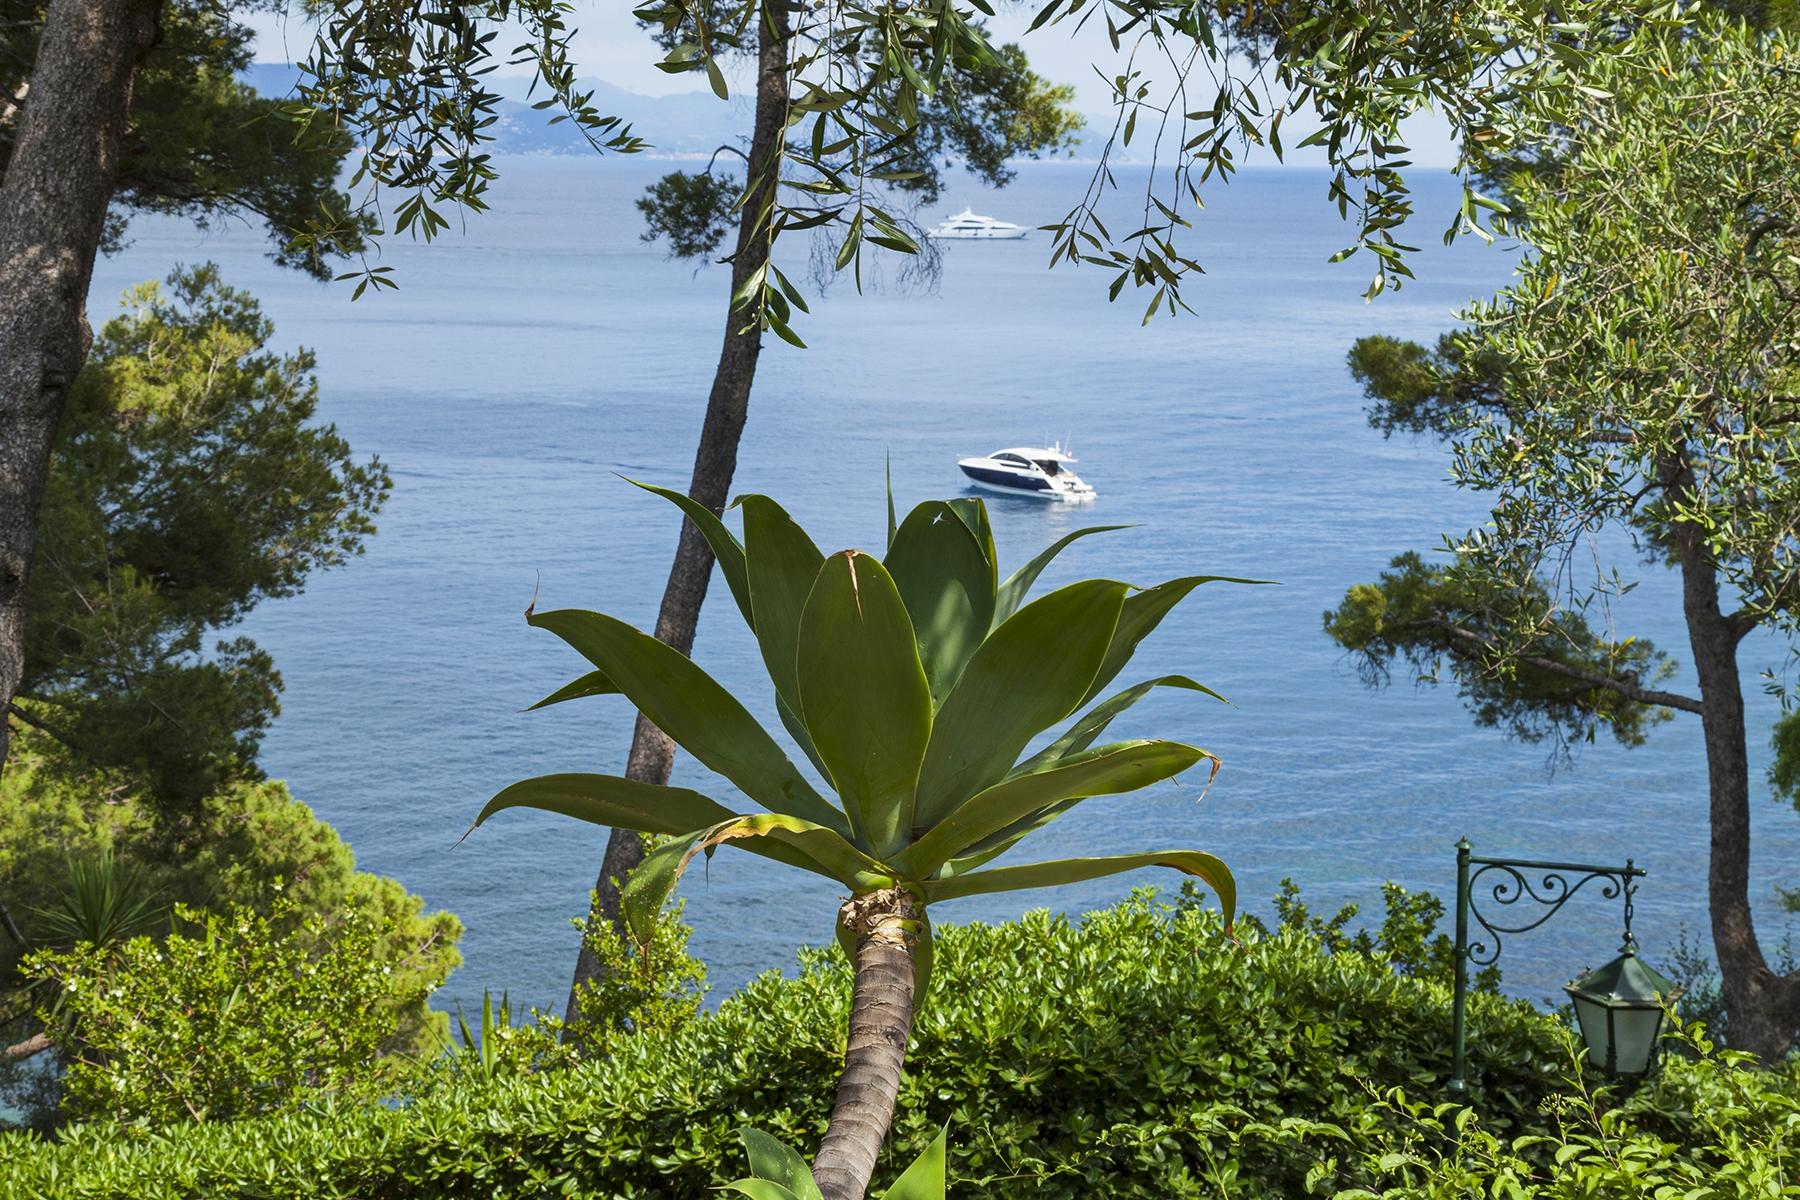 Villa in Vendita a Santa Margherita Ligure: 5 locali, 580 mq - Foto 8